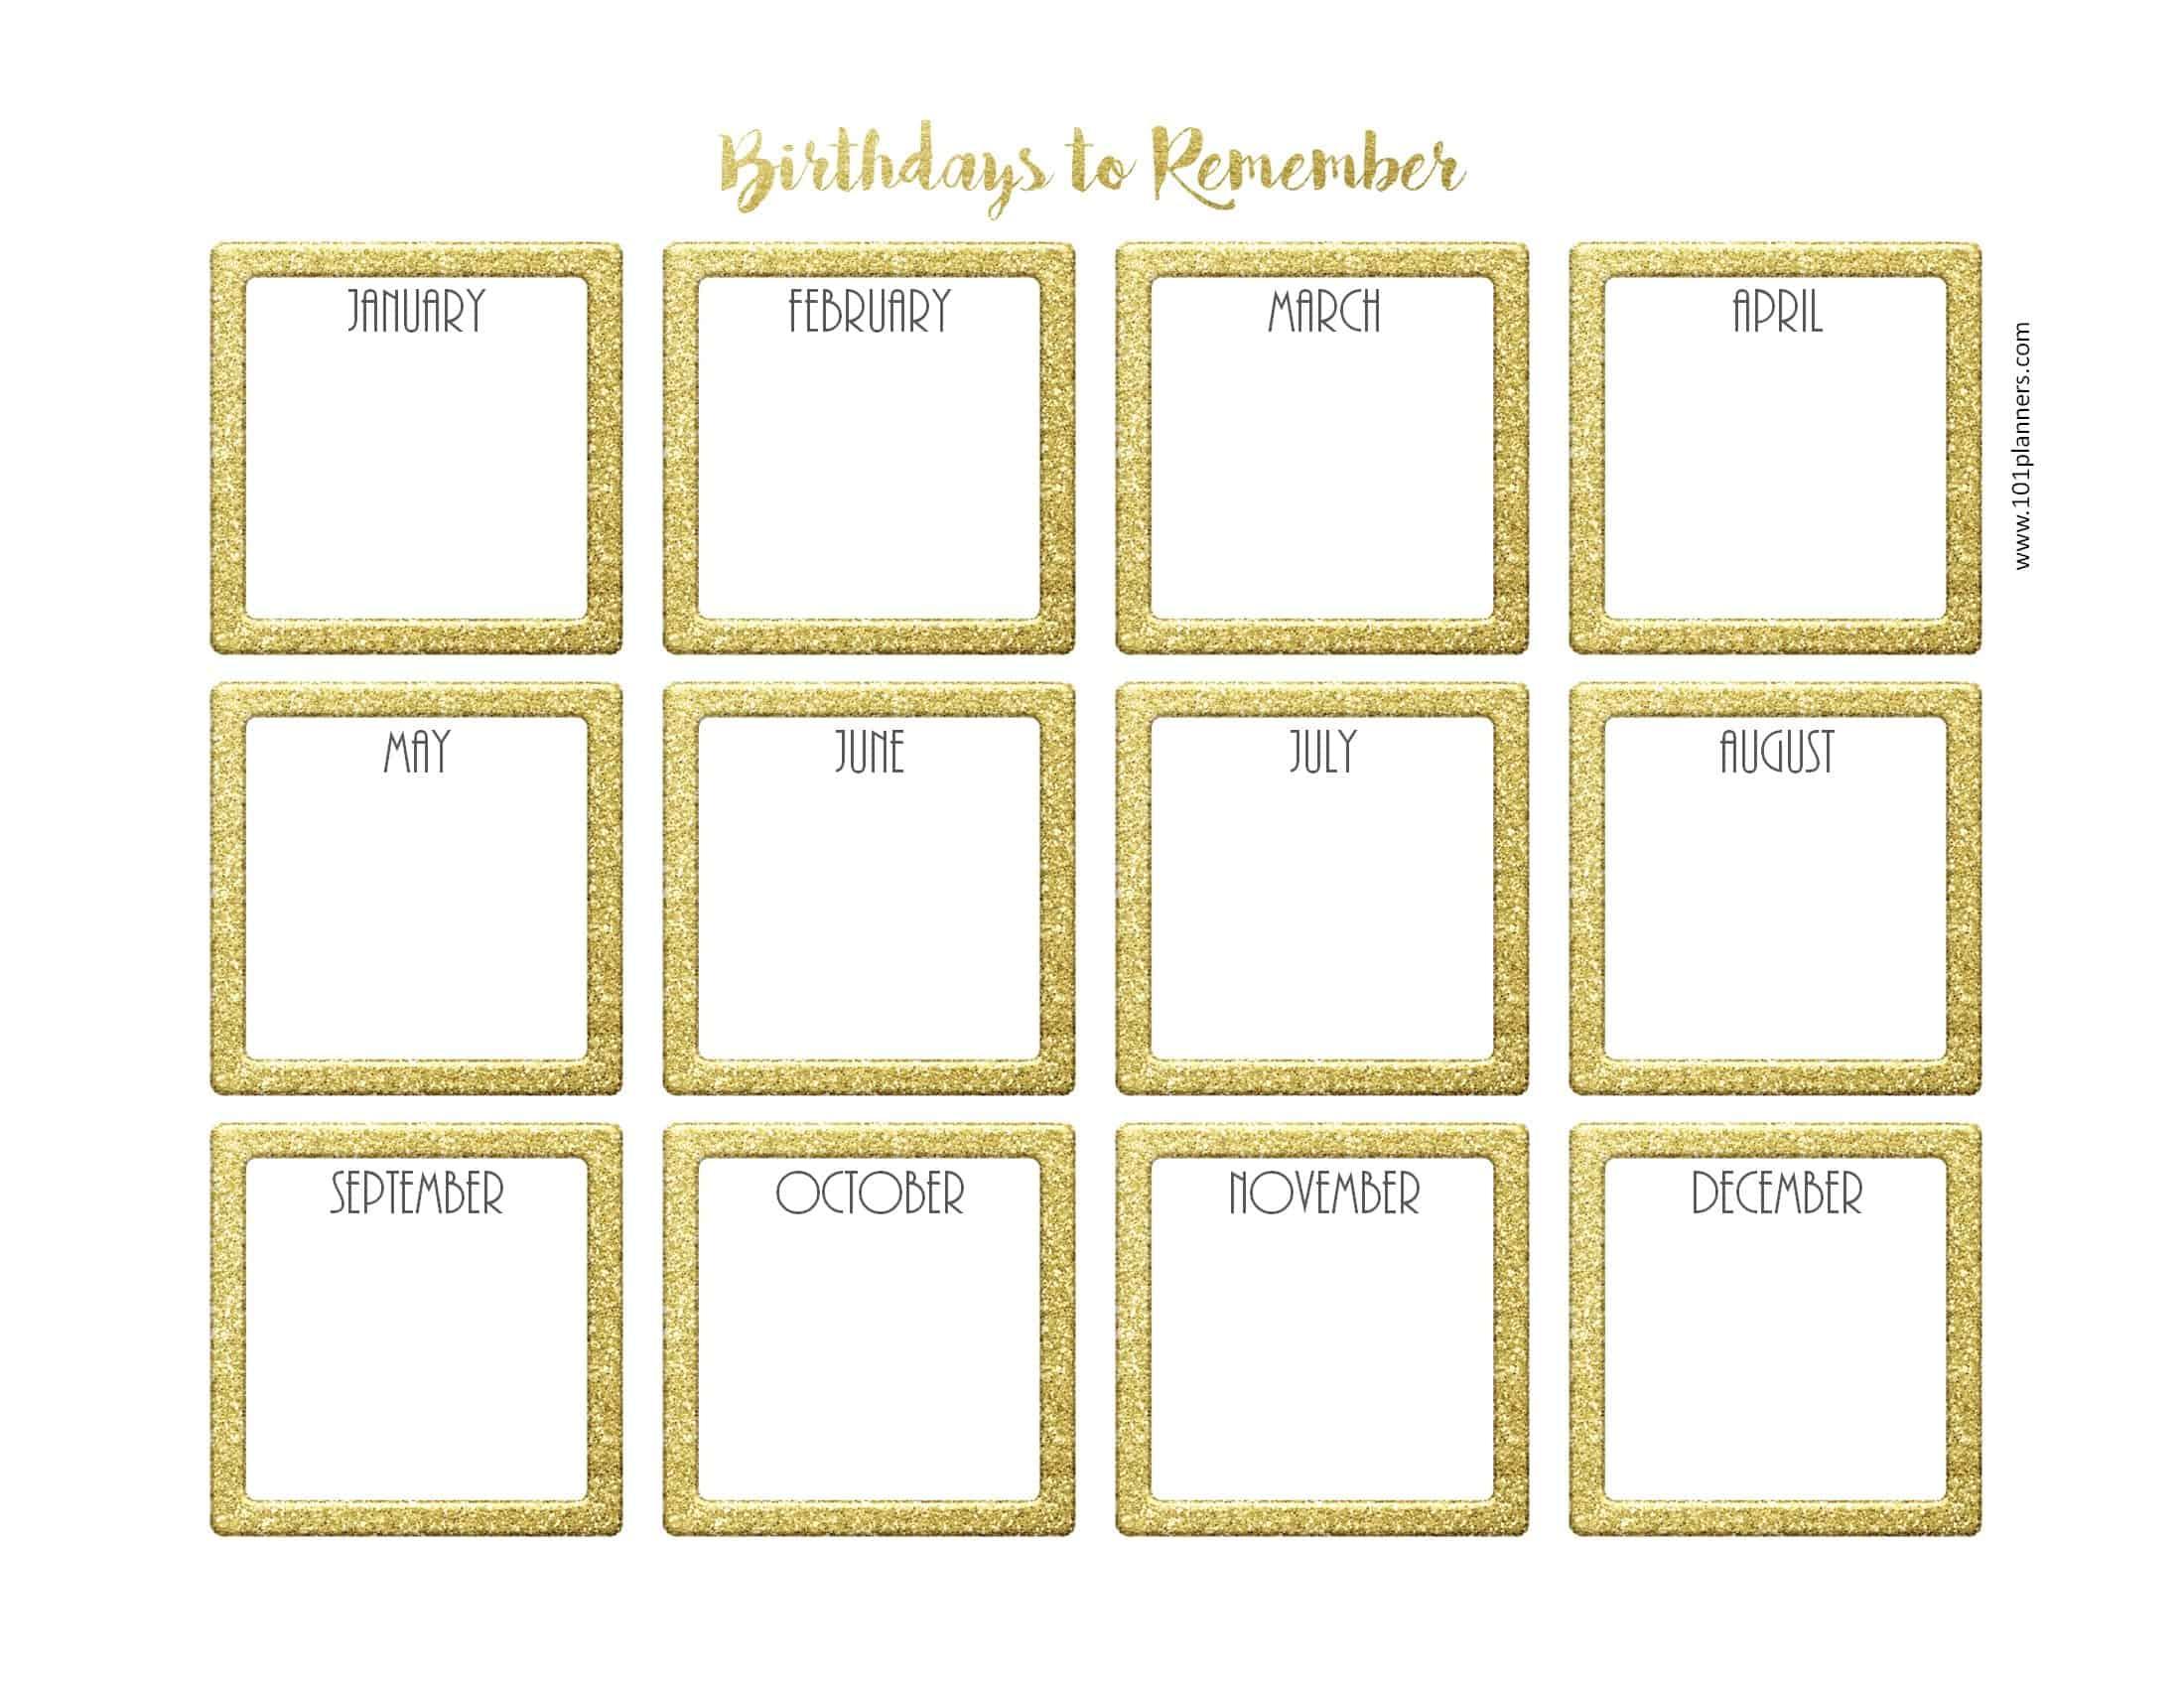 Free Birthday Calendar | Printable & Customizable | Many Designs! for Free Printable Birthday Calendar Template